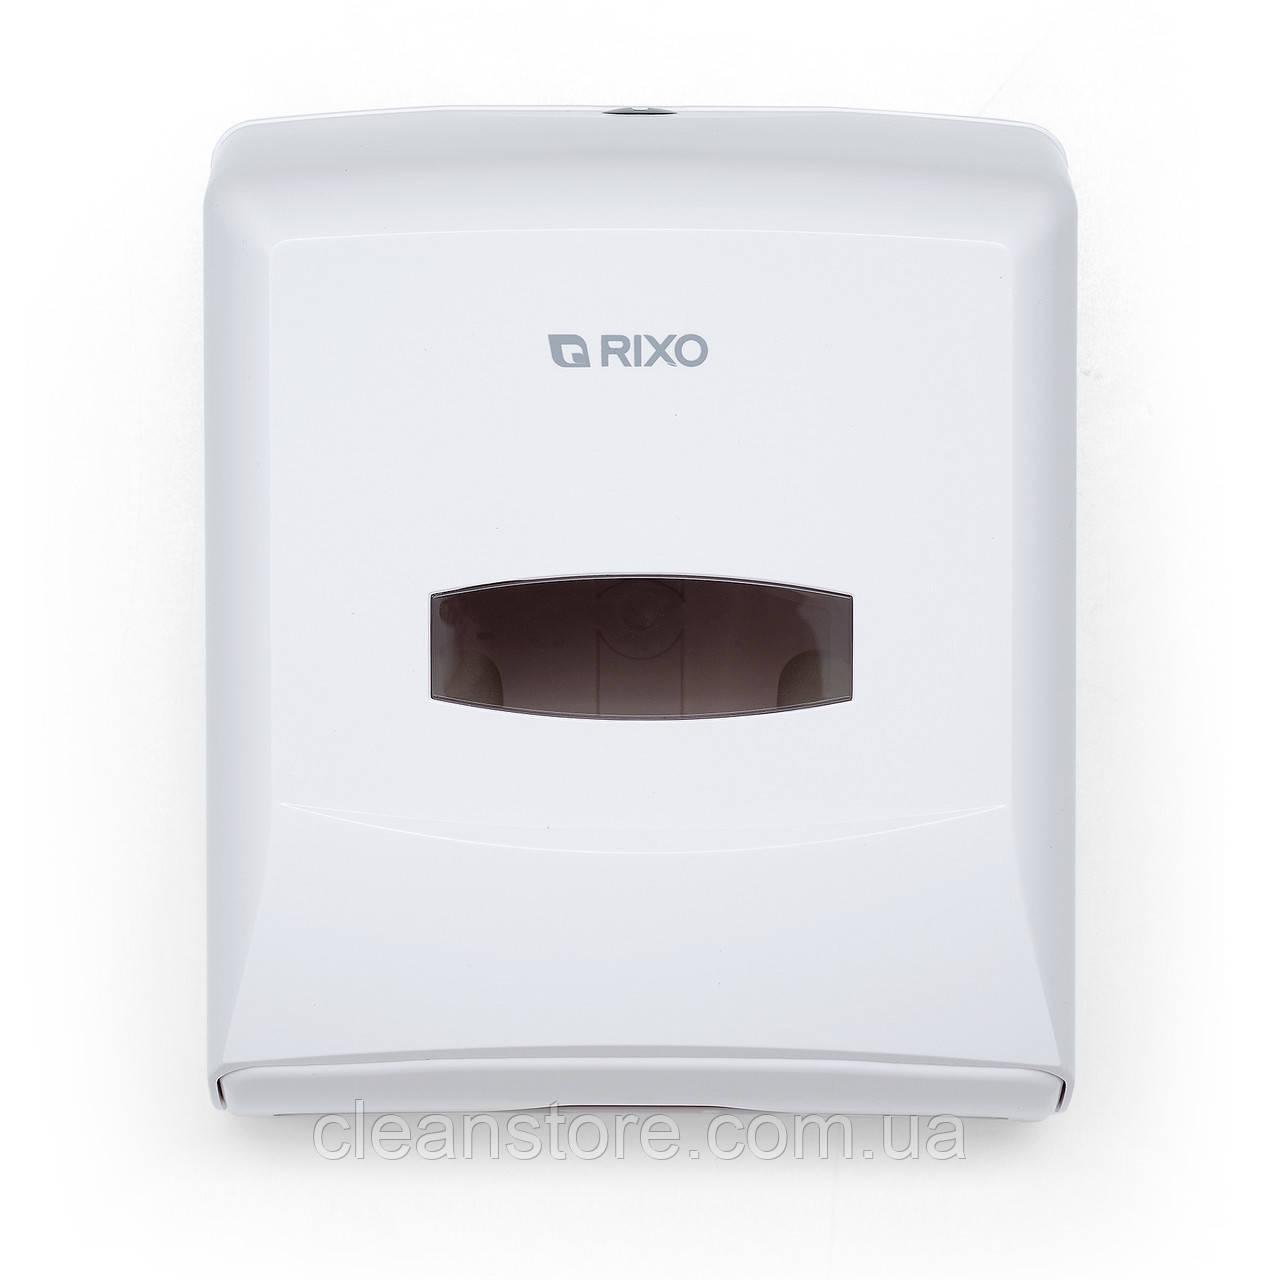 Диспенсер бумажных полотенец Rixo Grande P238W